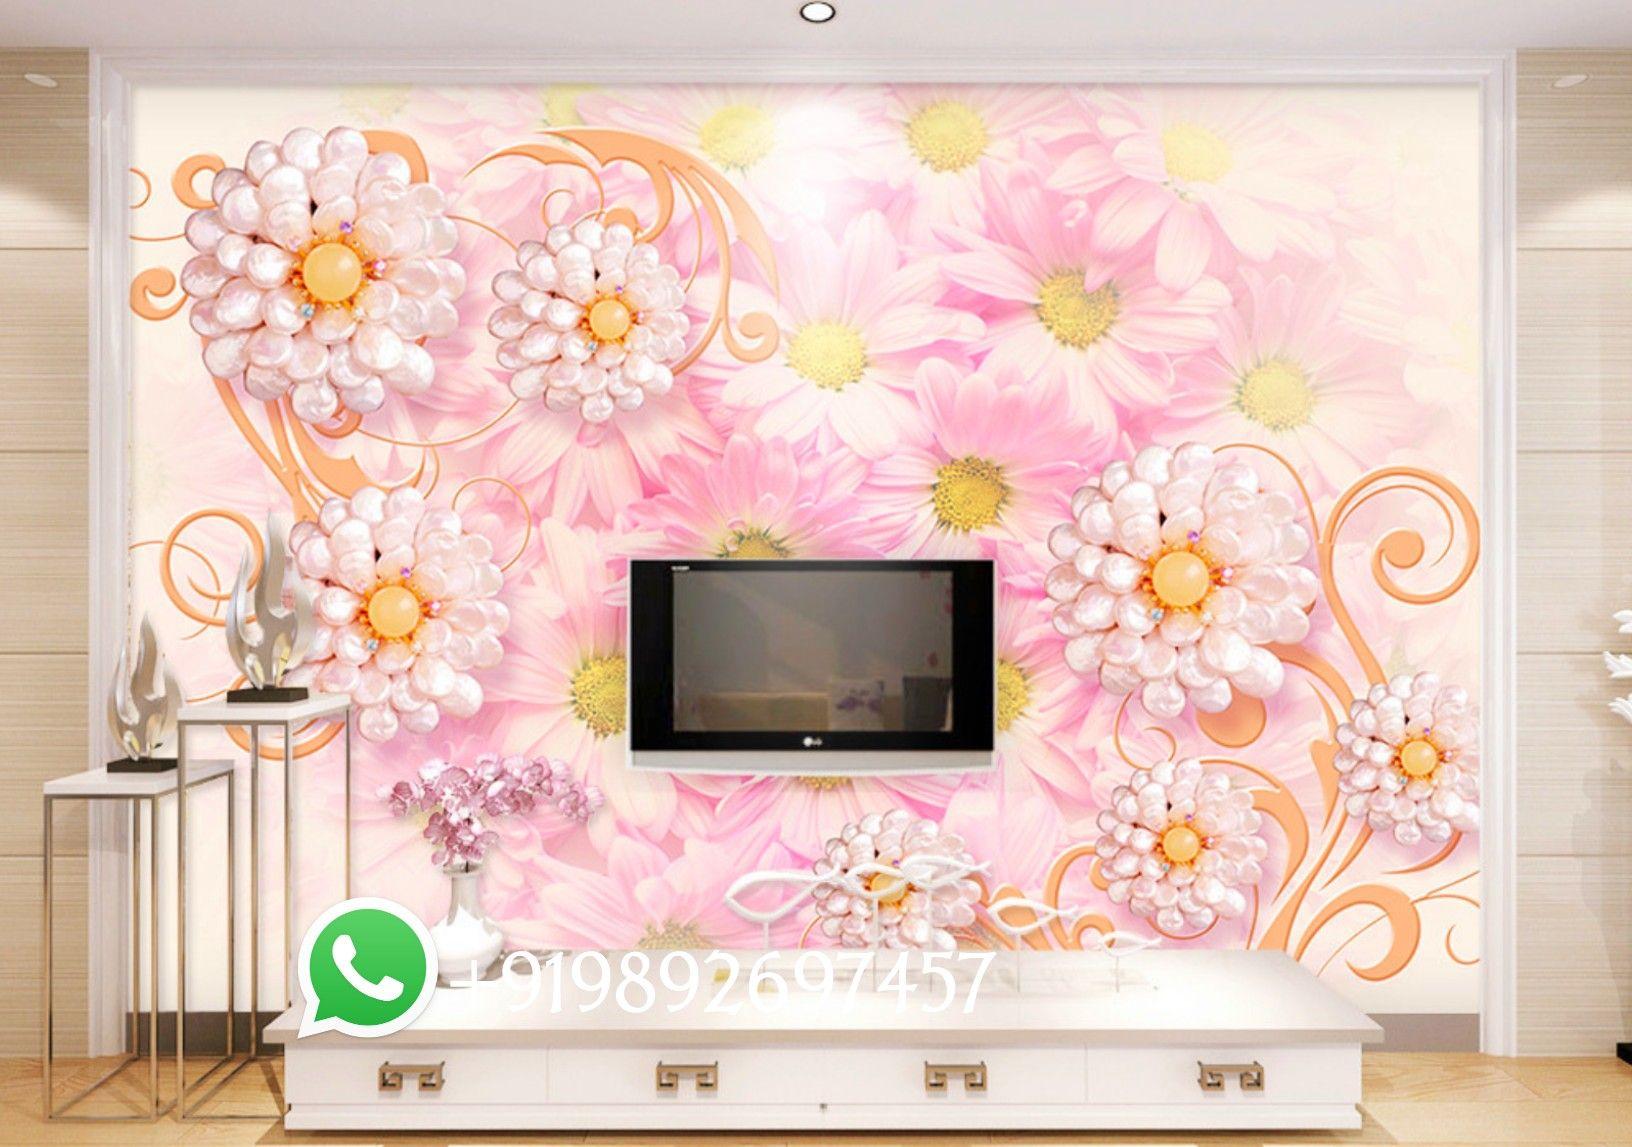 Pin On 5d Mural Wallpaper 5d Mural Wallpaper For Walls